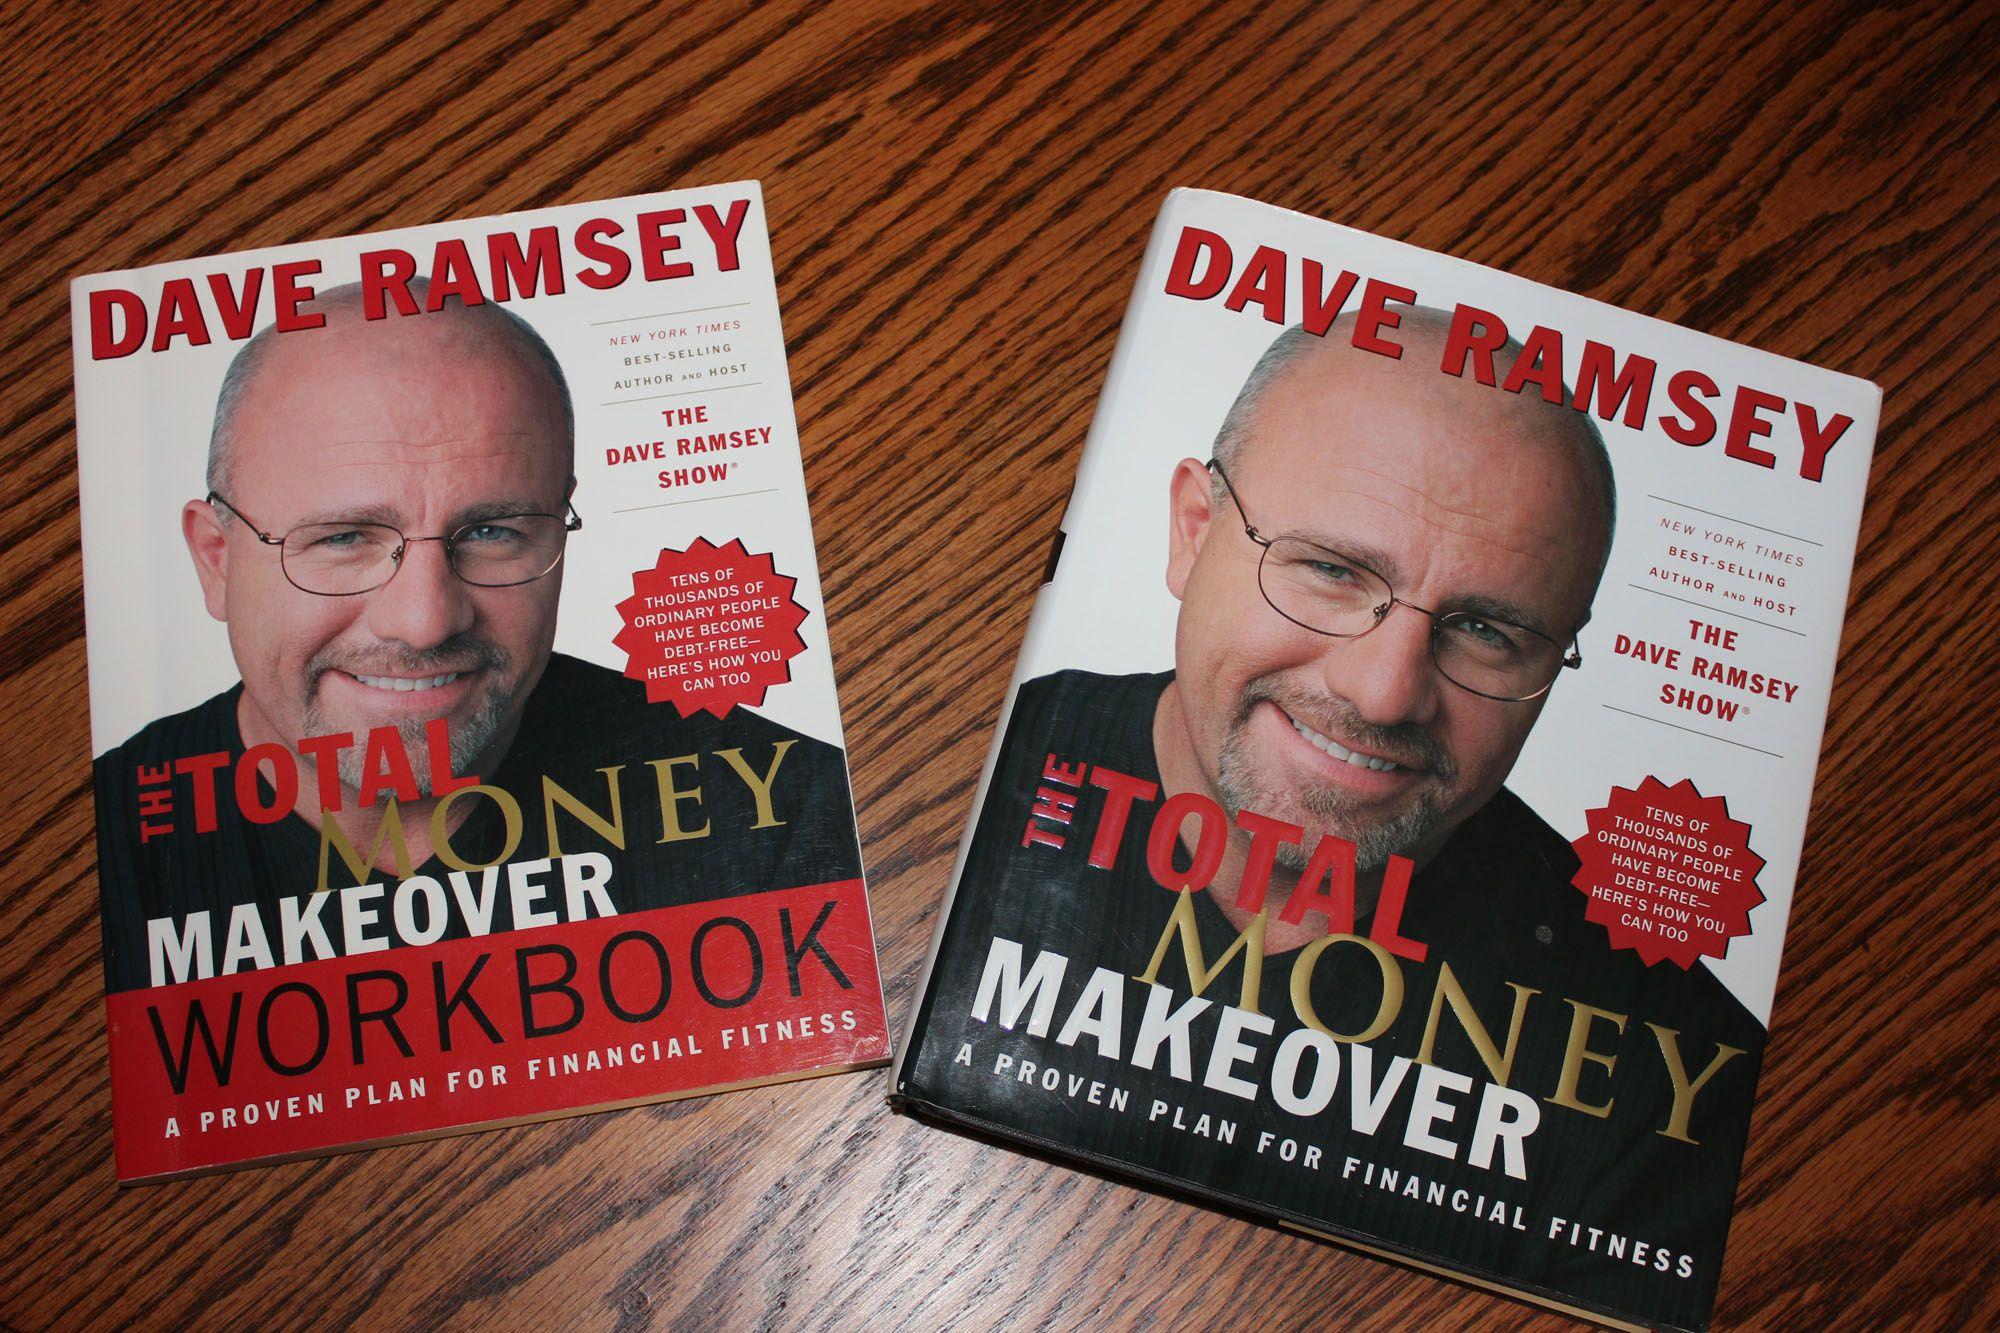 Love Dave Ramsey